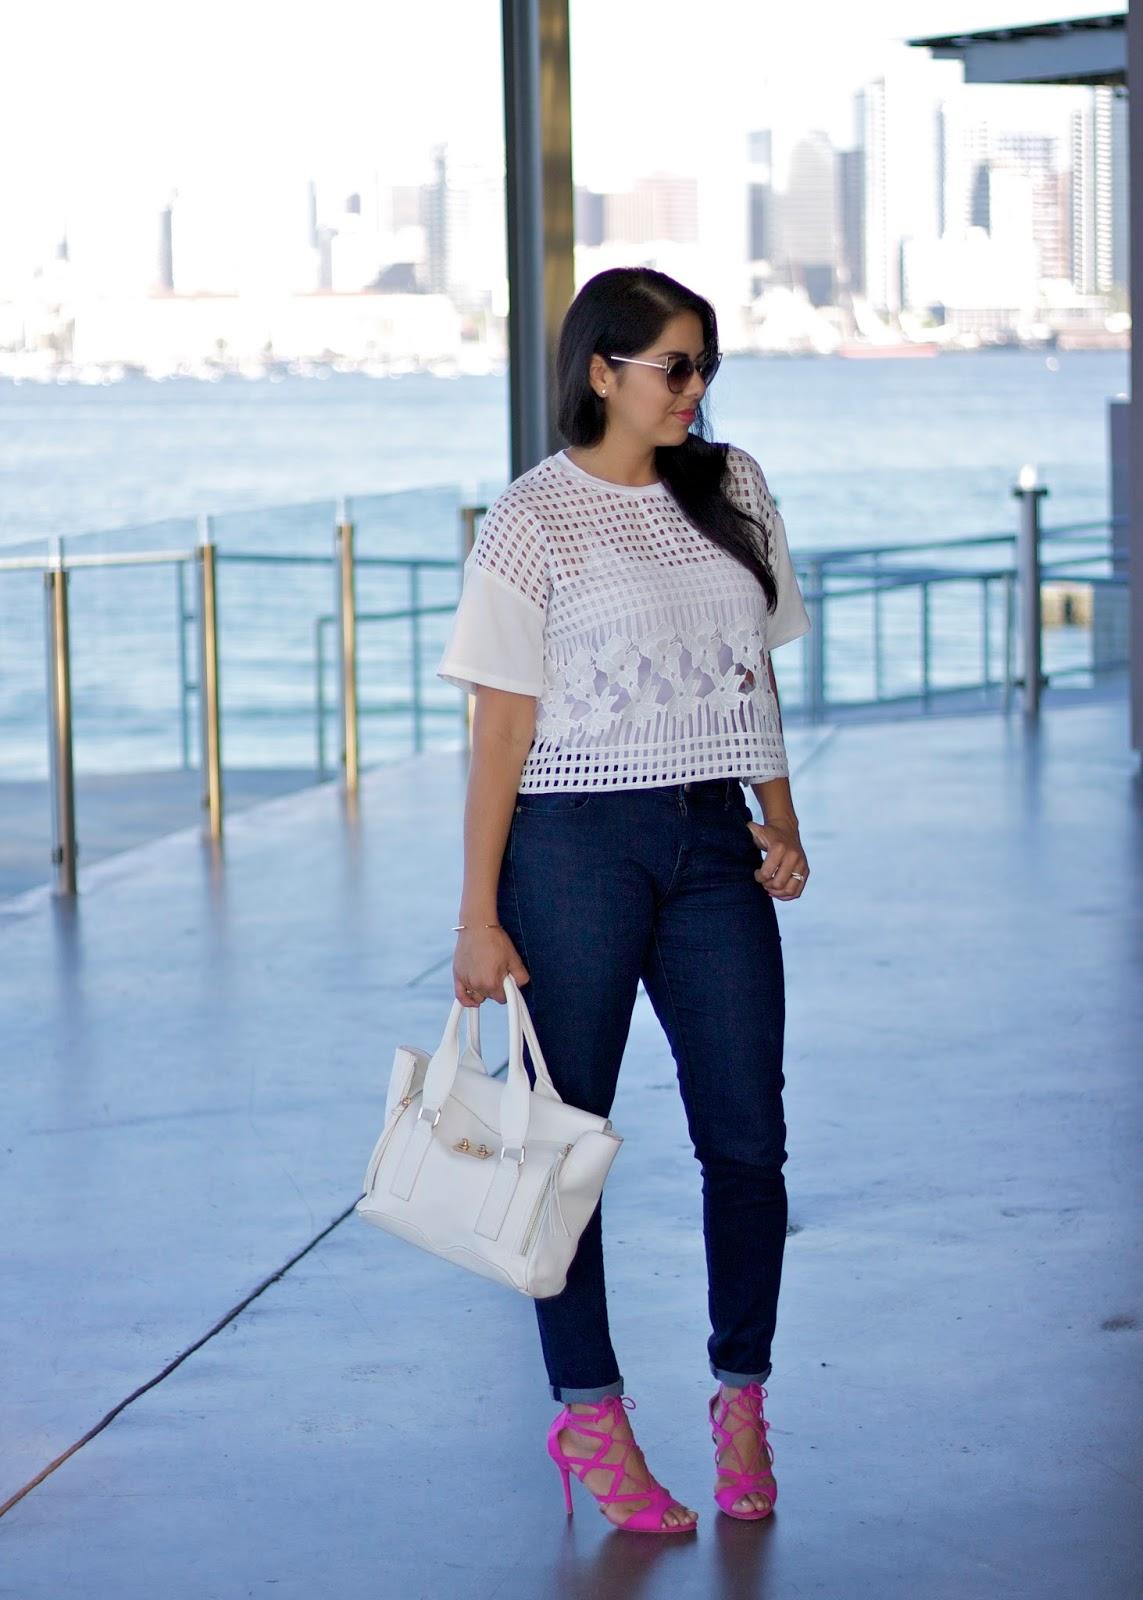 Justfab pink sandal heels, socal latina, cabi denim, cabi blogger